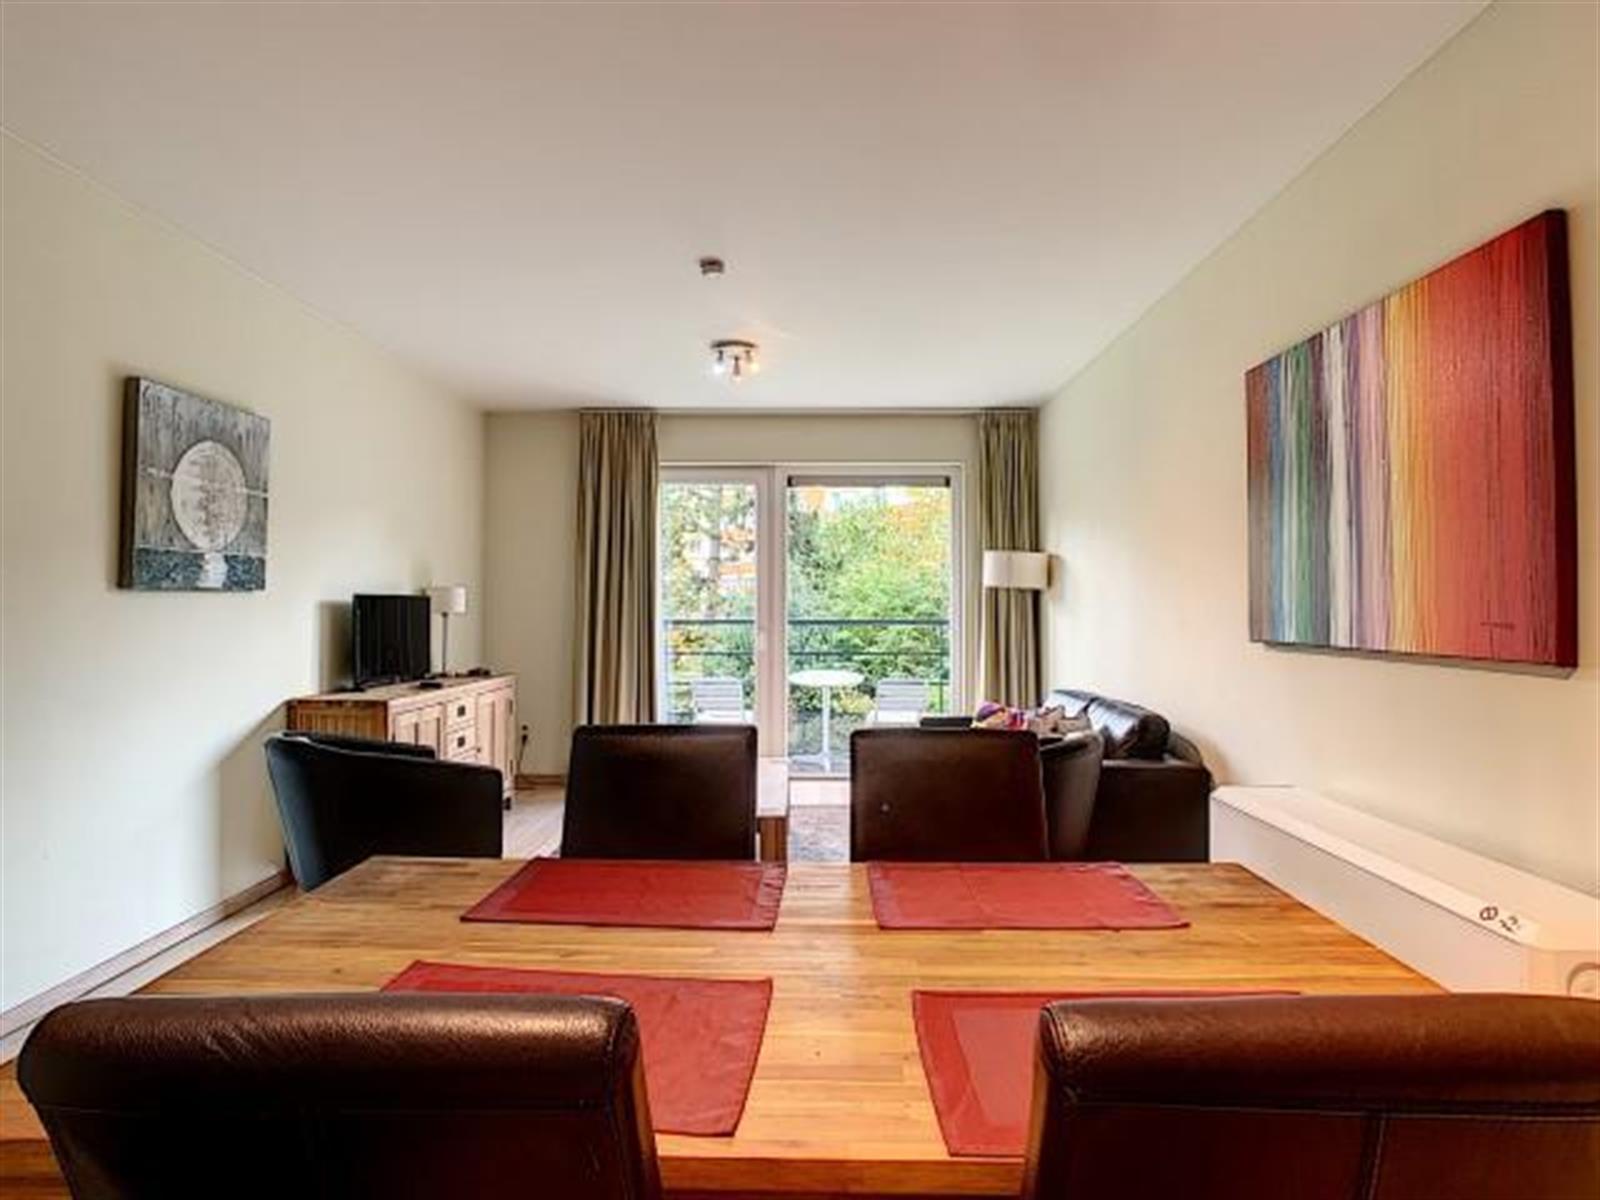 Appartement - Woluwe-Saint-Lambert - #4147227-3